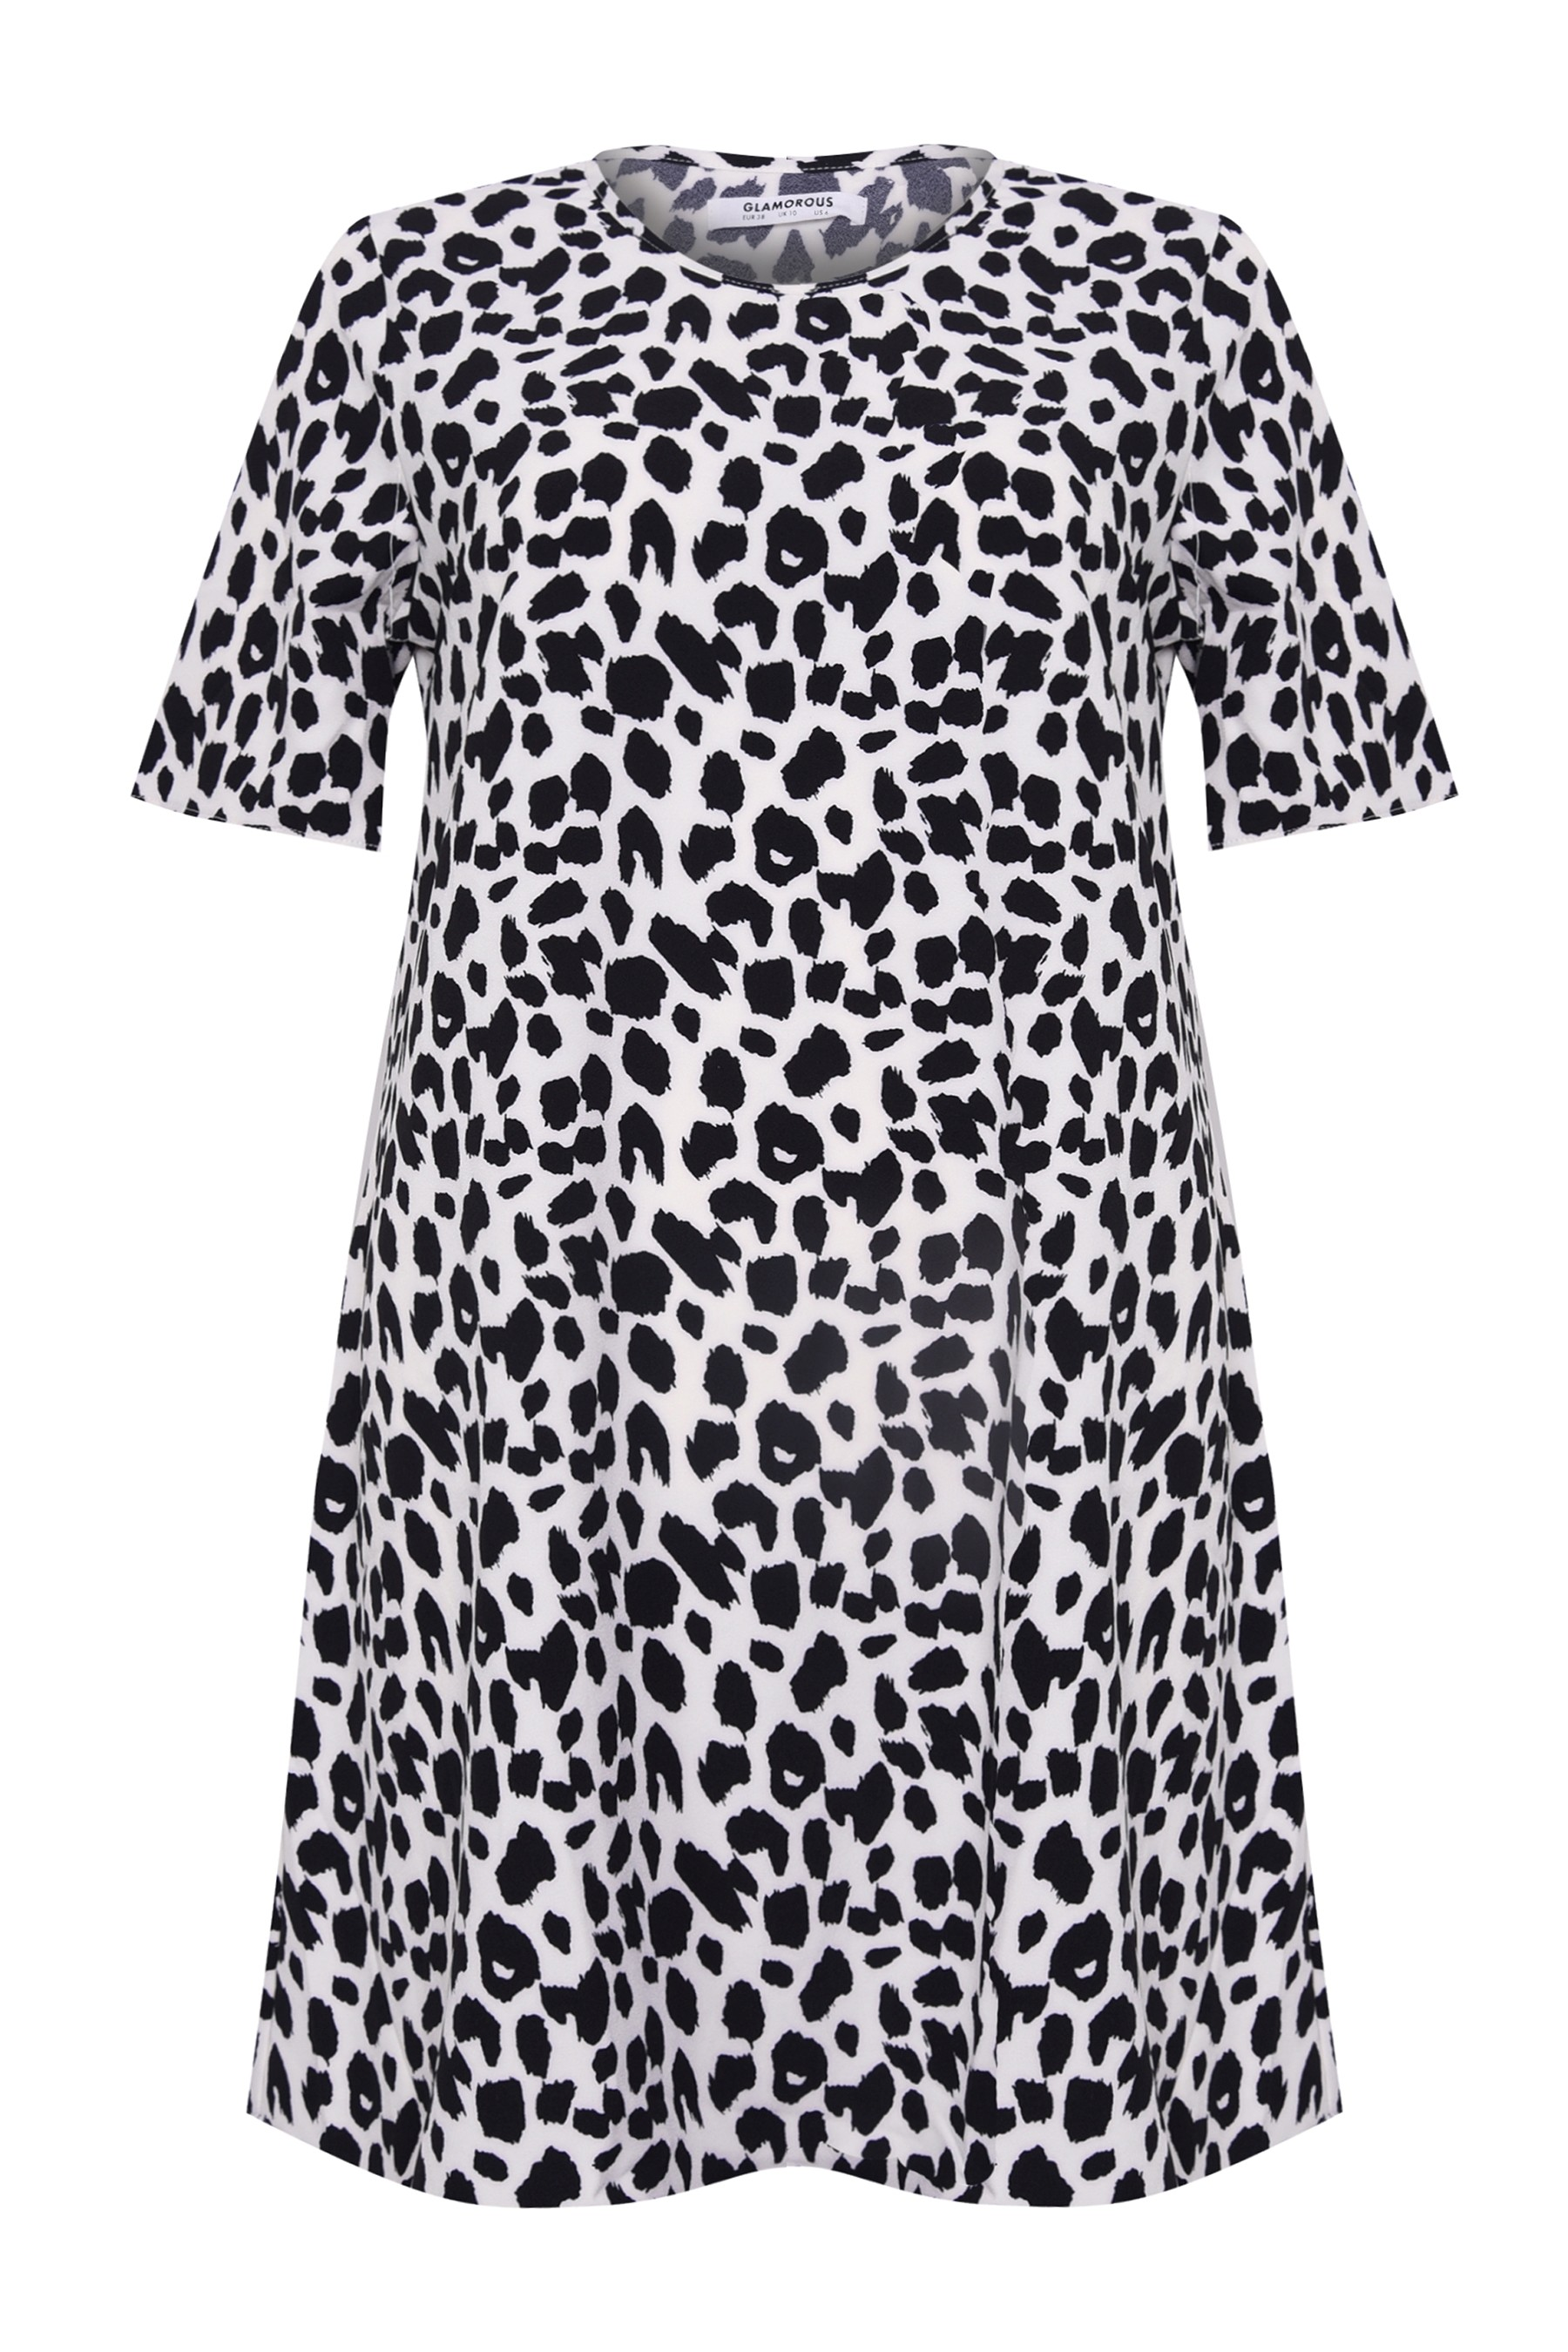 14181d07f68 Womens Glamorous Animal Print Shift Dress - Black in 2019